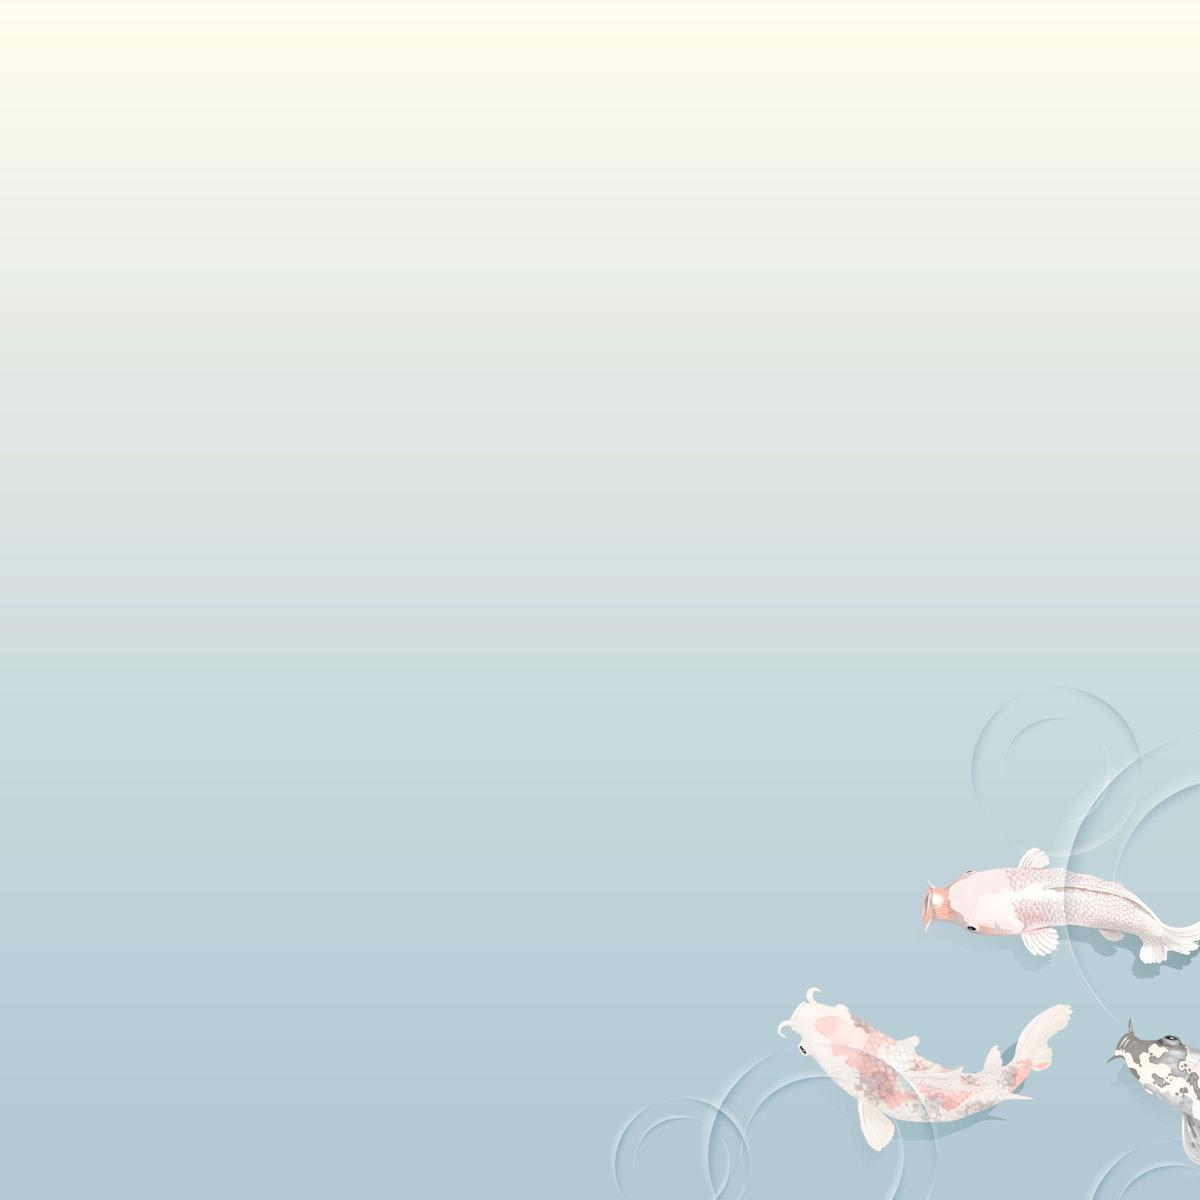 Vintage koi fish decorated background